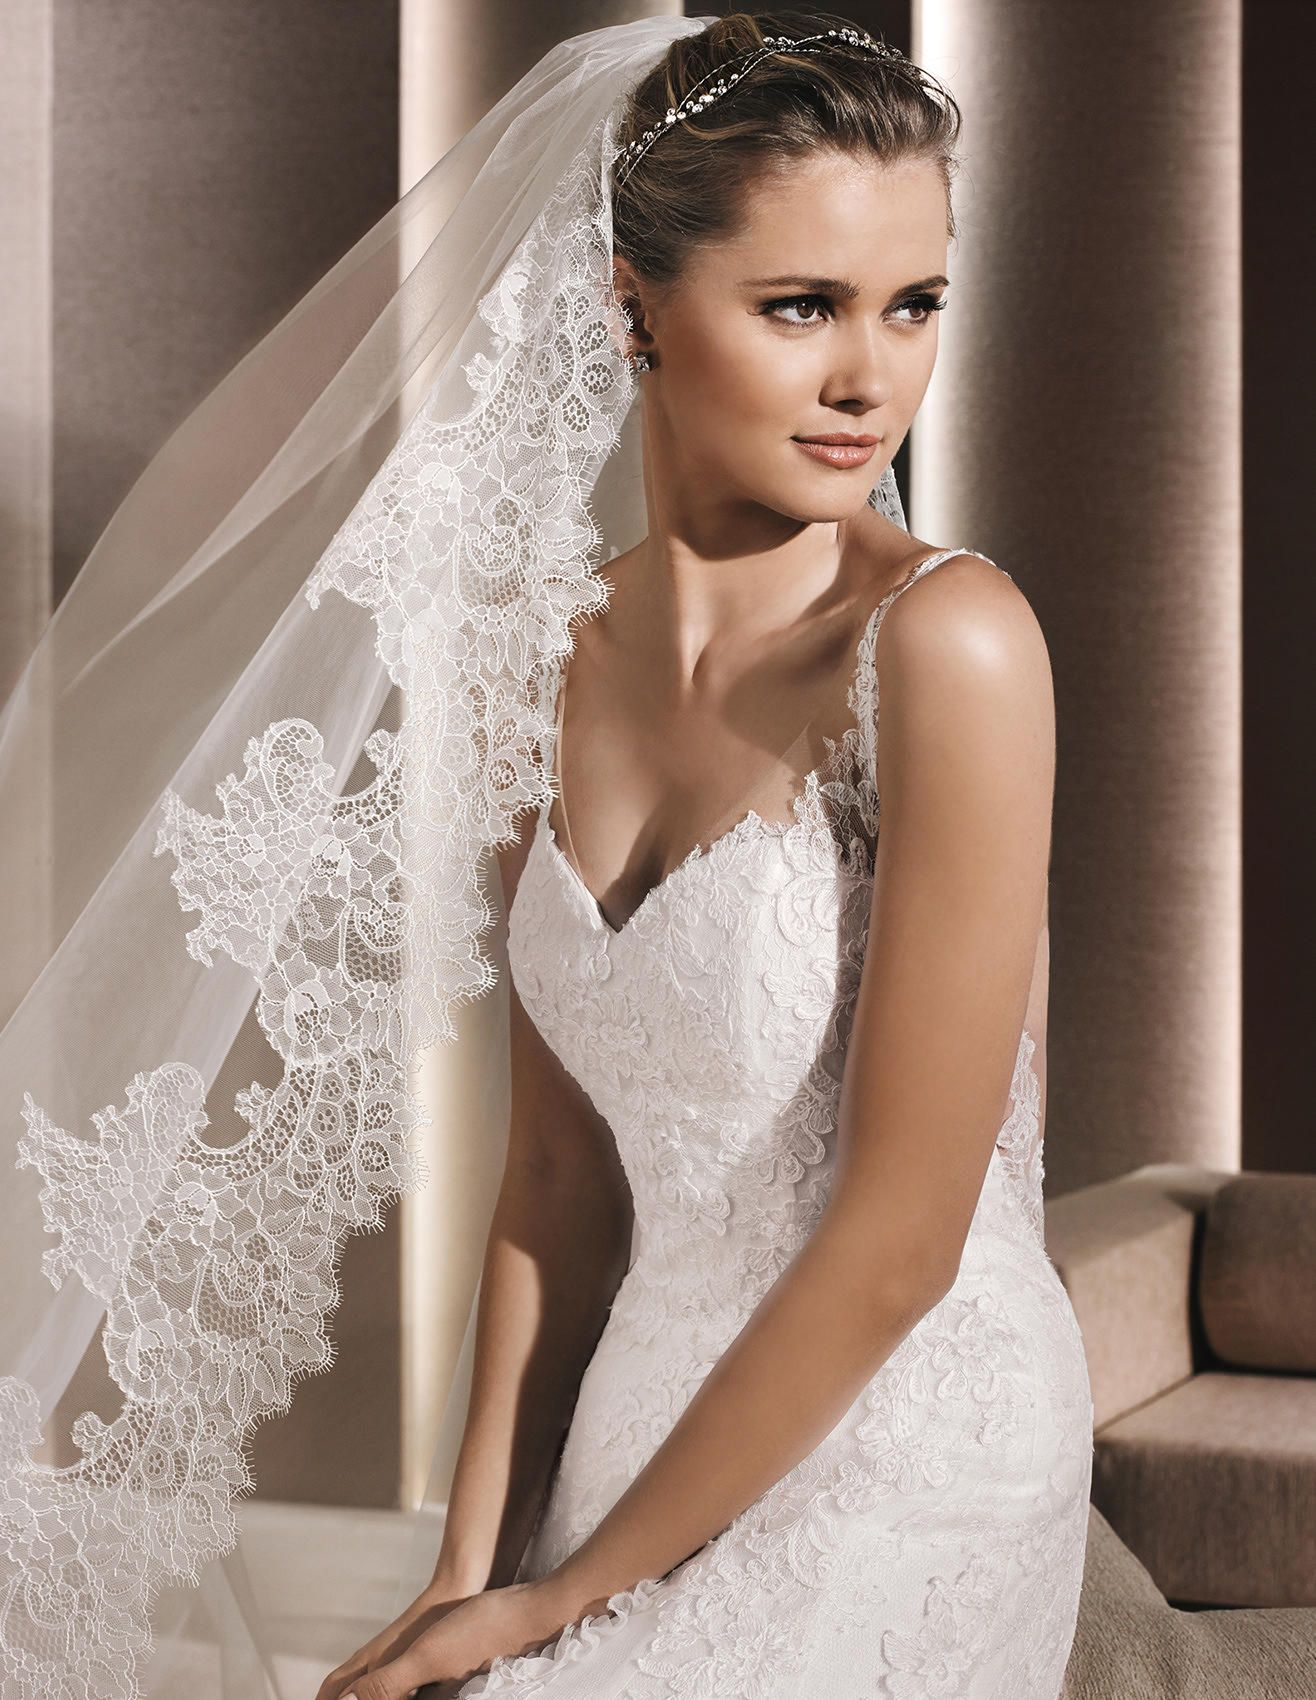 RANIT - Lace wedding dress, with sweetheart neckline | La Sposa